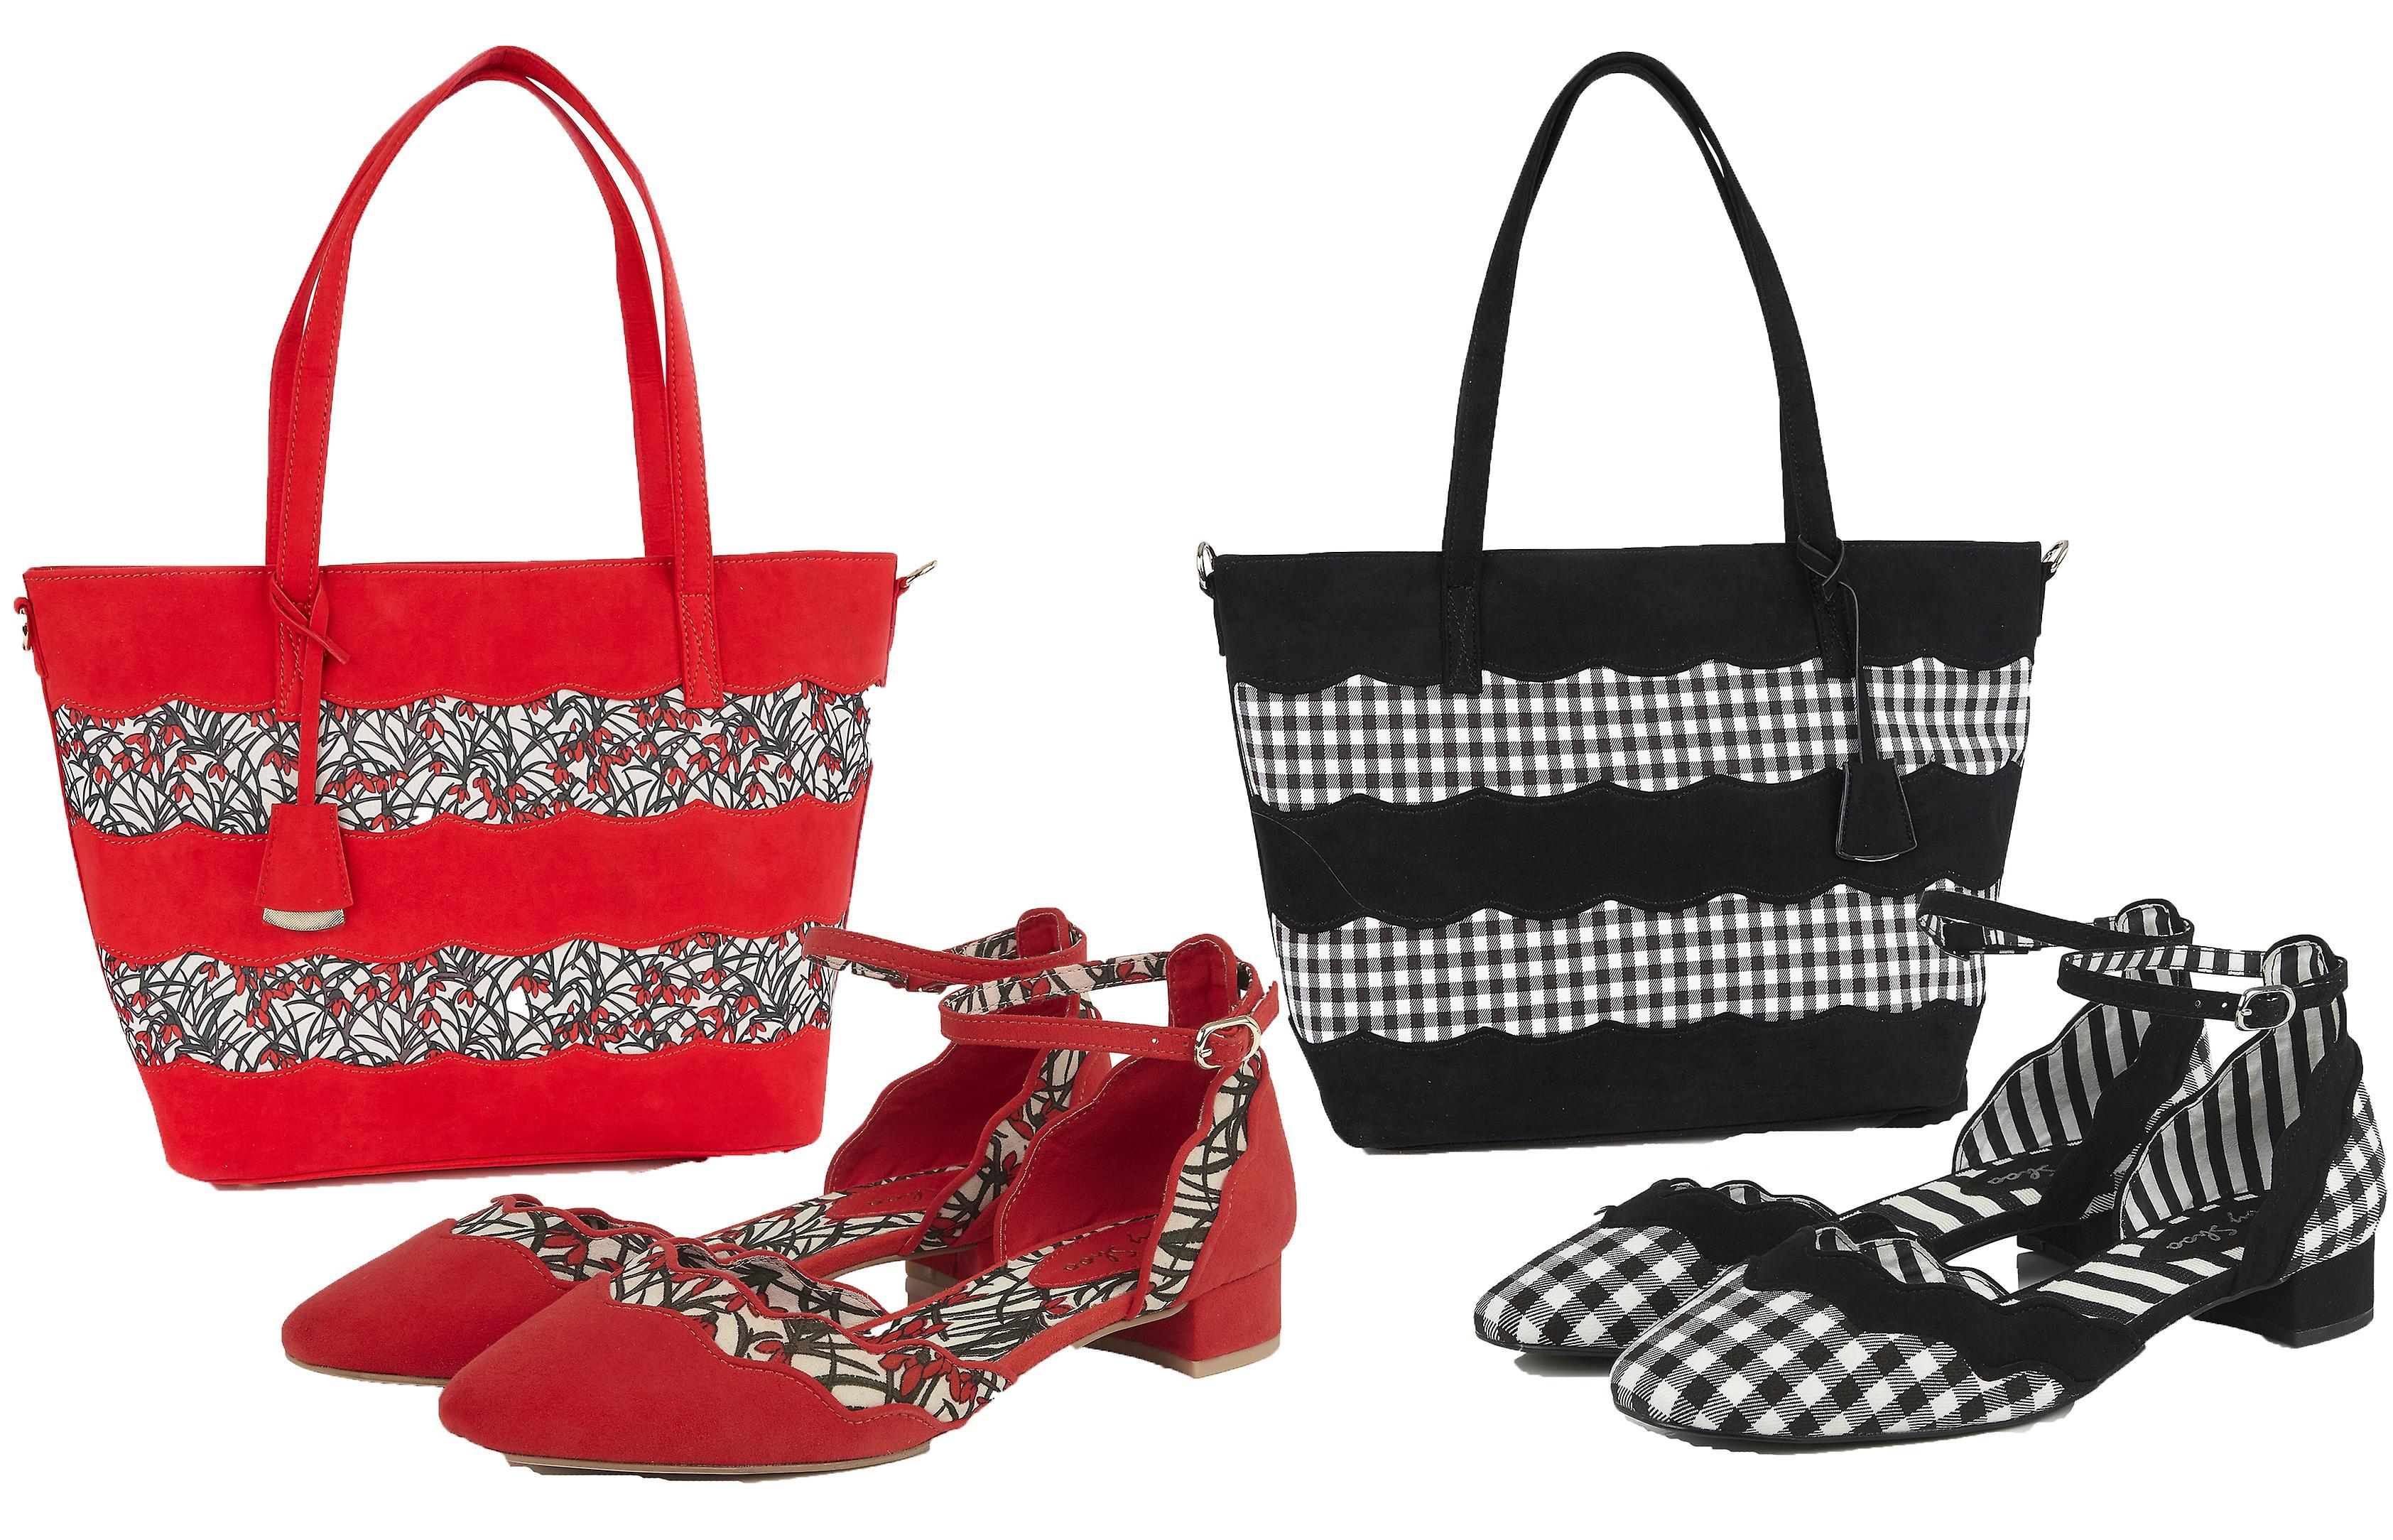 Ruby Shoo Women's Lydia Low Block Heel Shoes & Matching Mijas Shopper Bag pkpXb